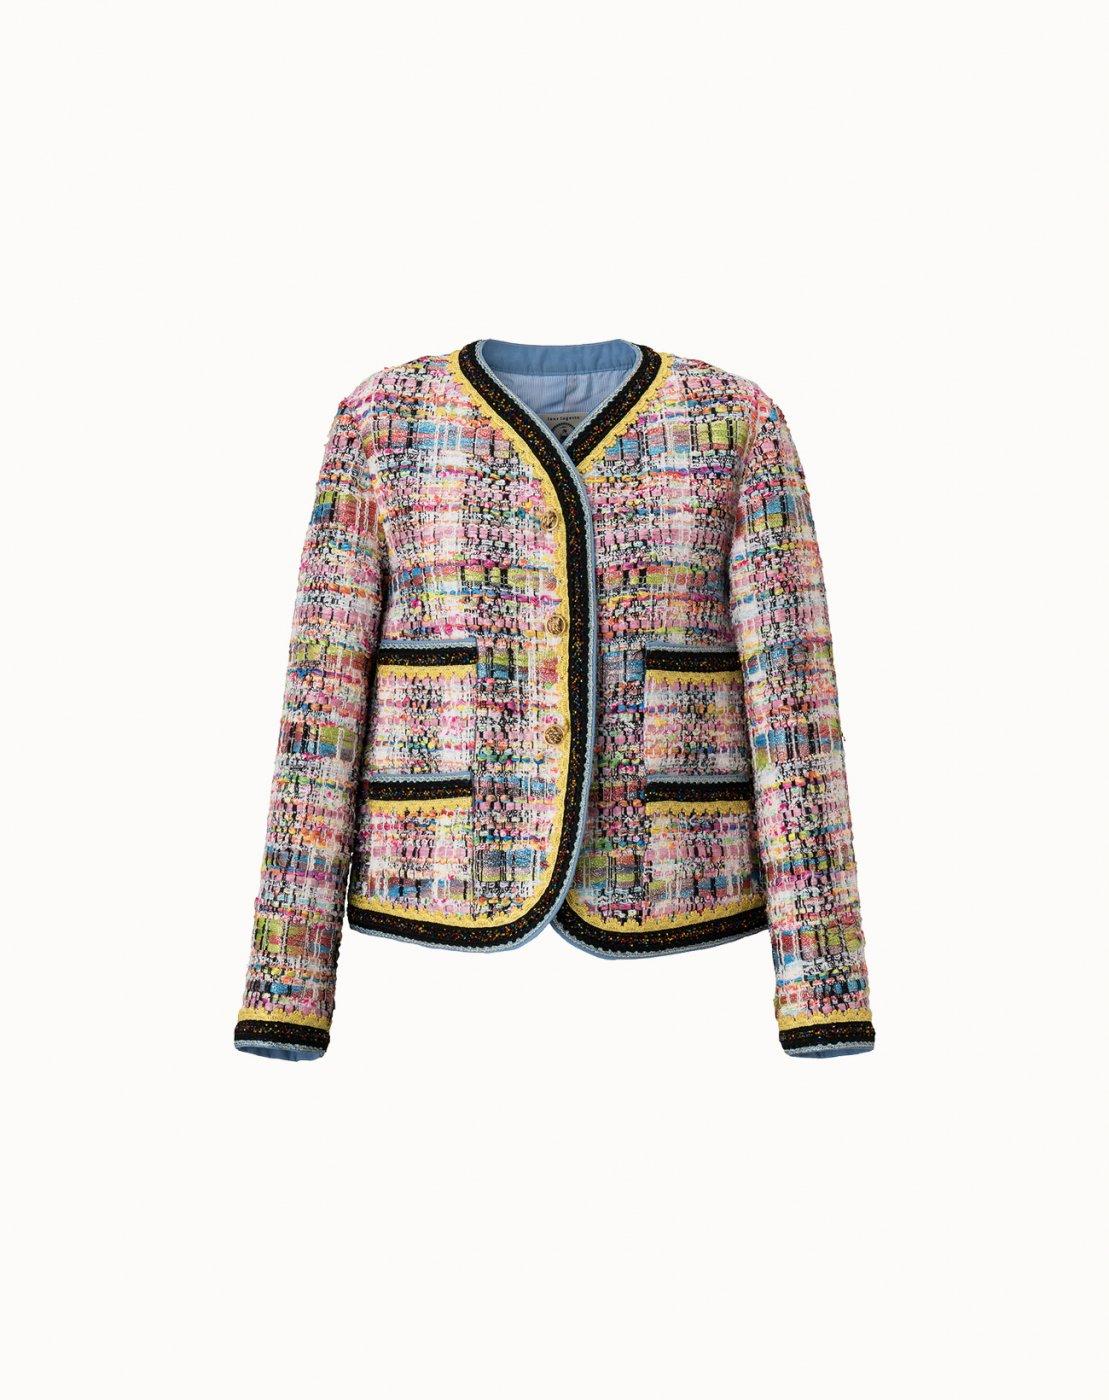 leur logette - Candy Tweed Jacket - Off-White